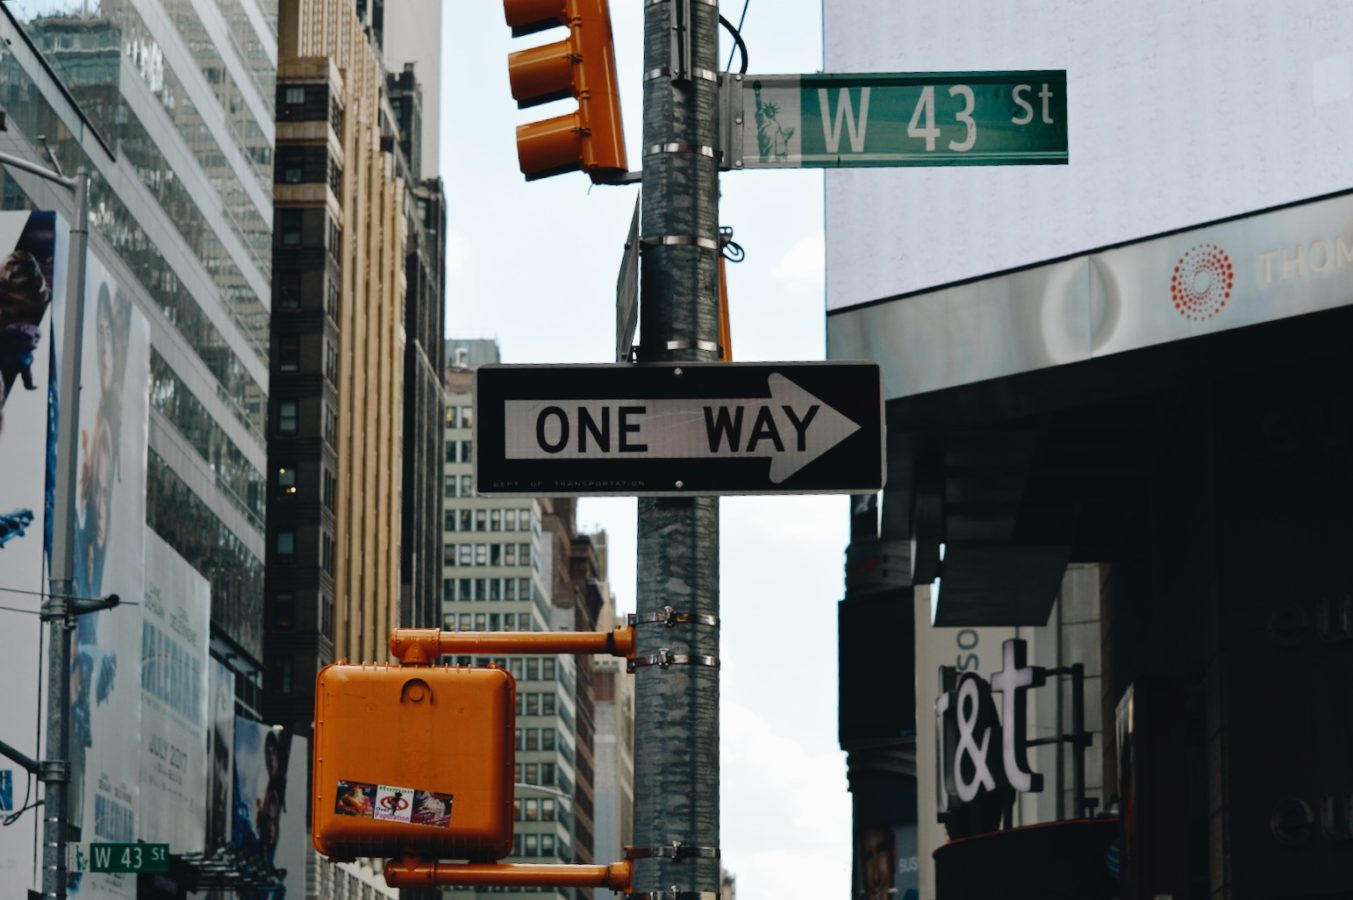 W 43 Street